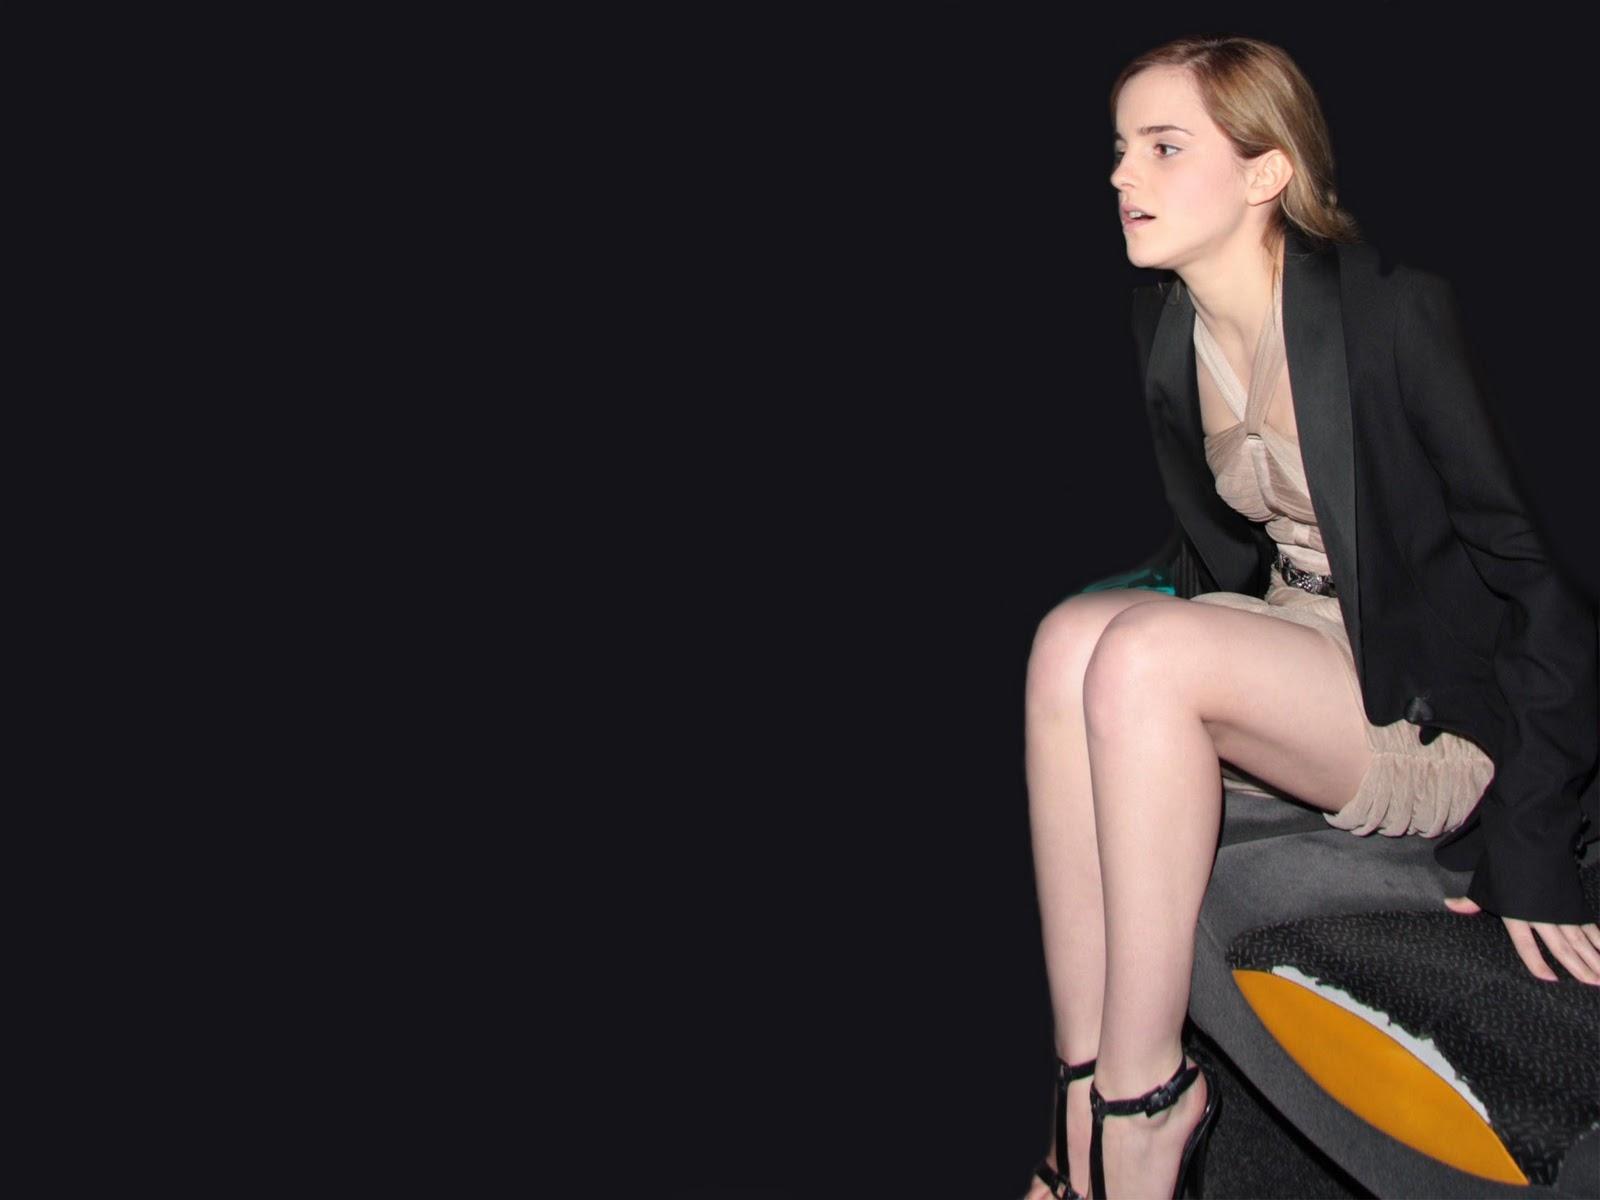 Emma Watson Naked Wallpaper